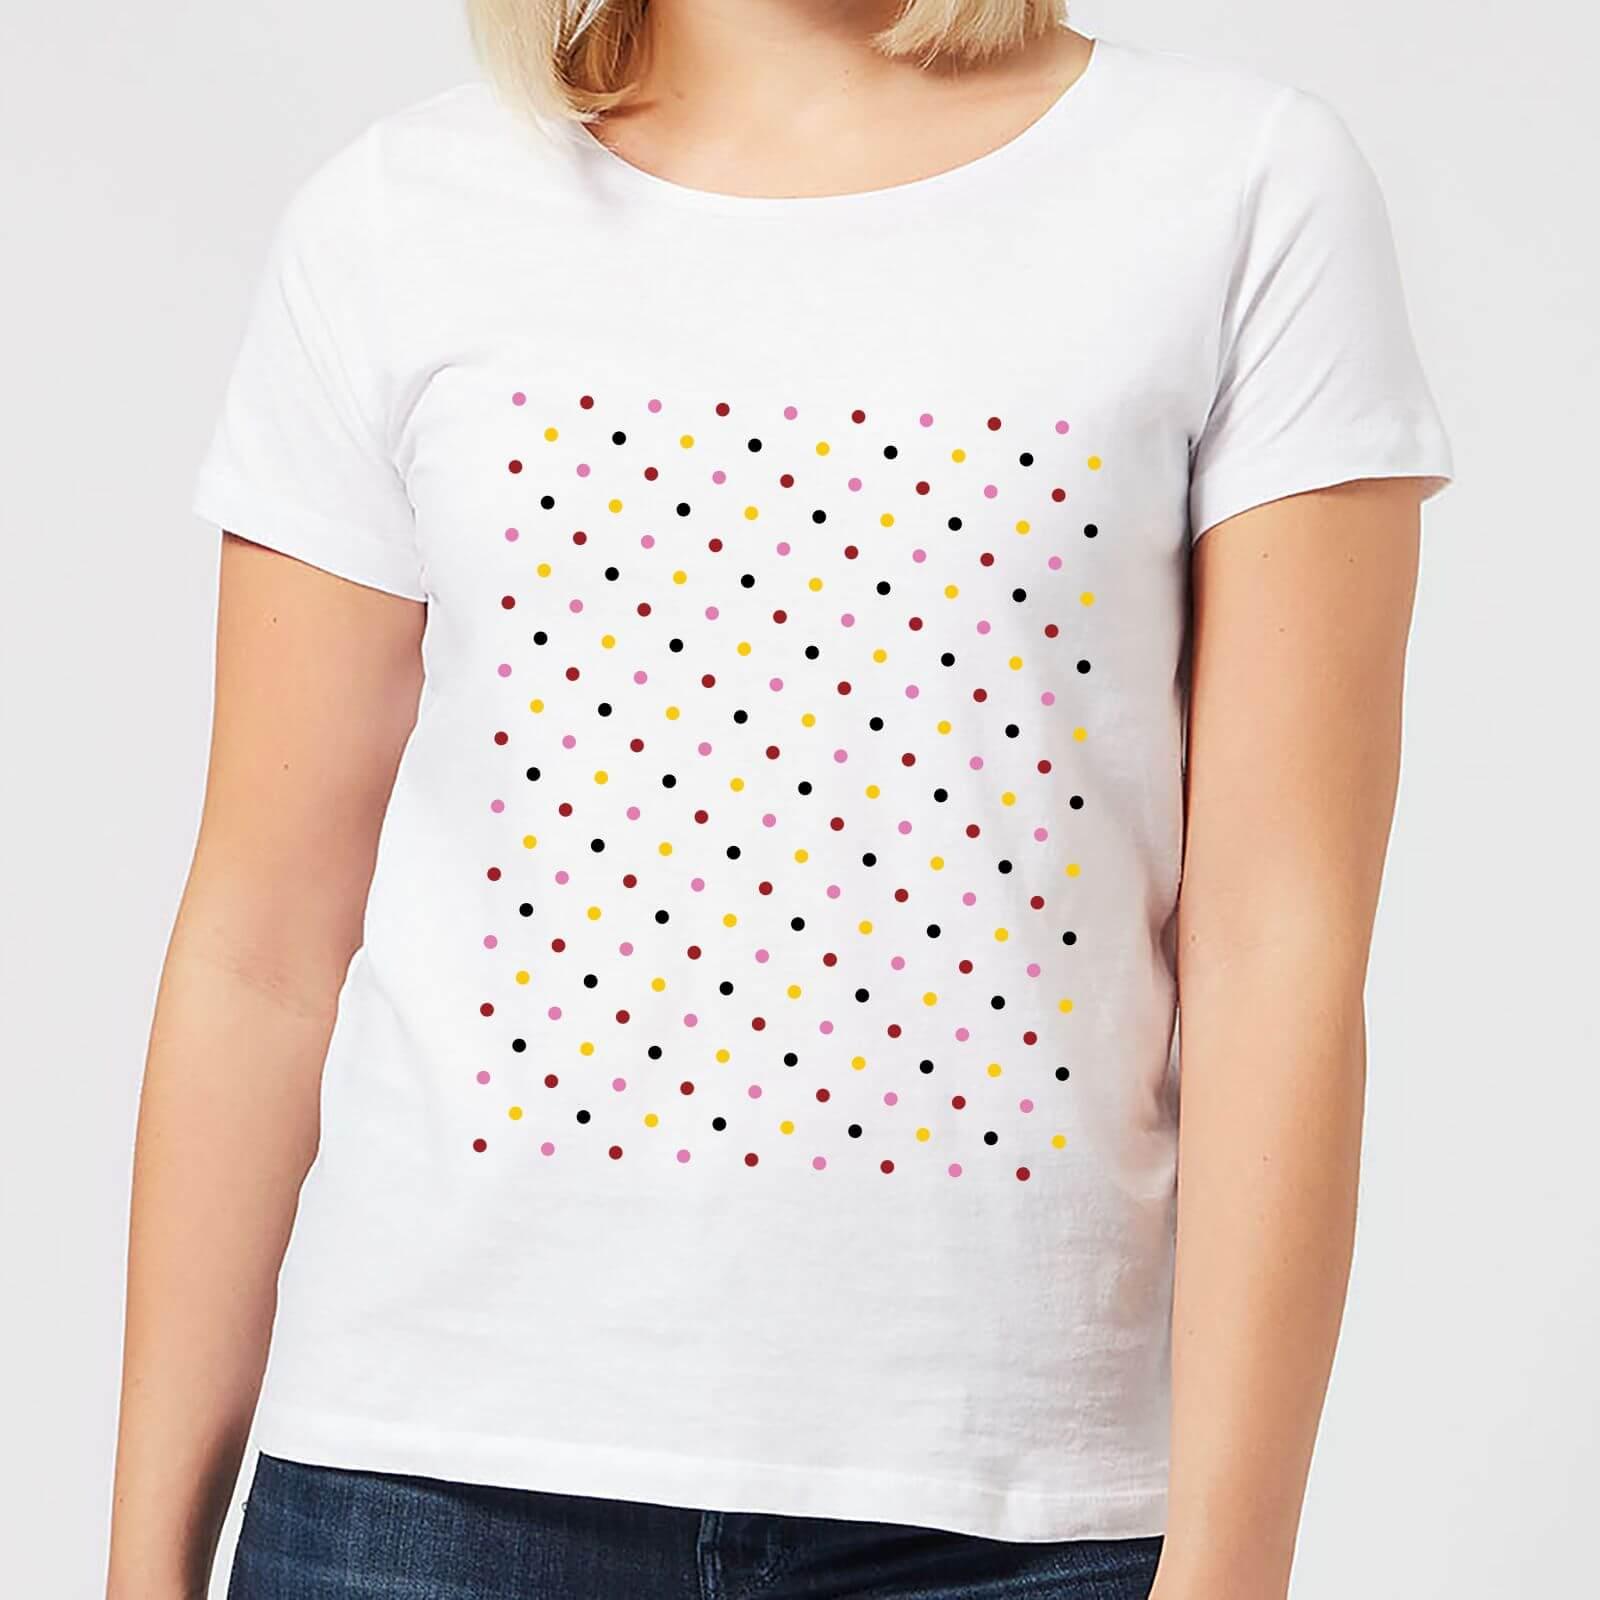 Summit Finish Grand Tour Dots Womens T-shirt - White - Xs - White